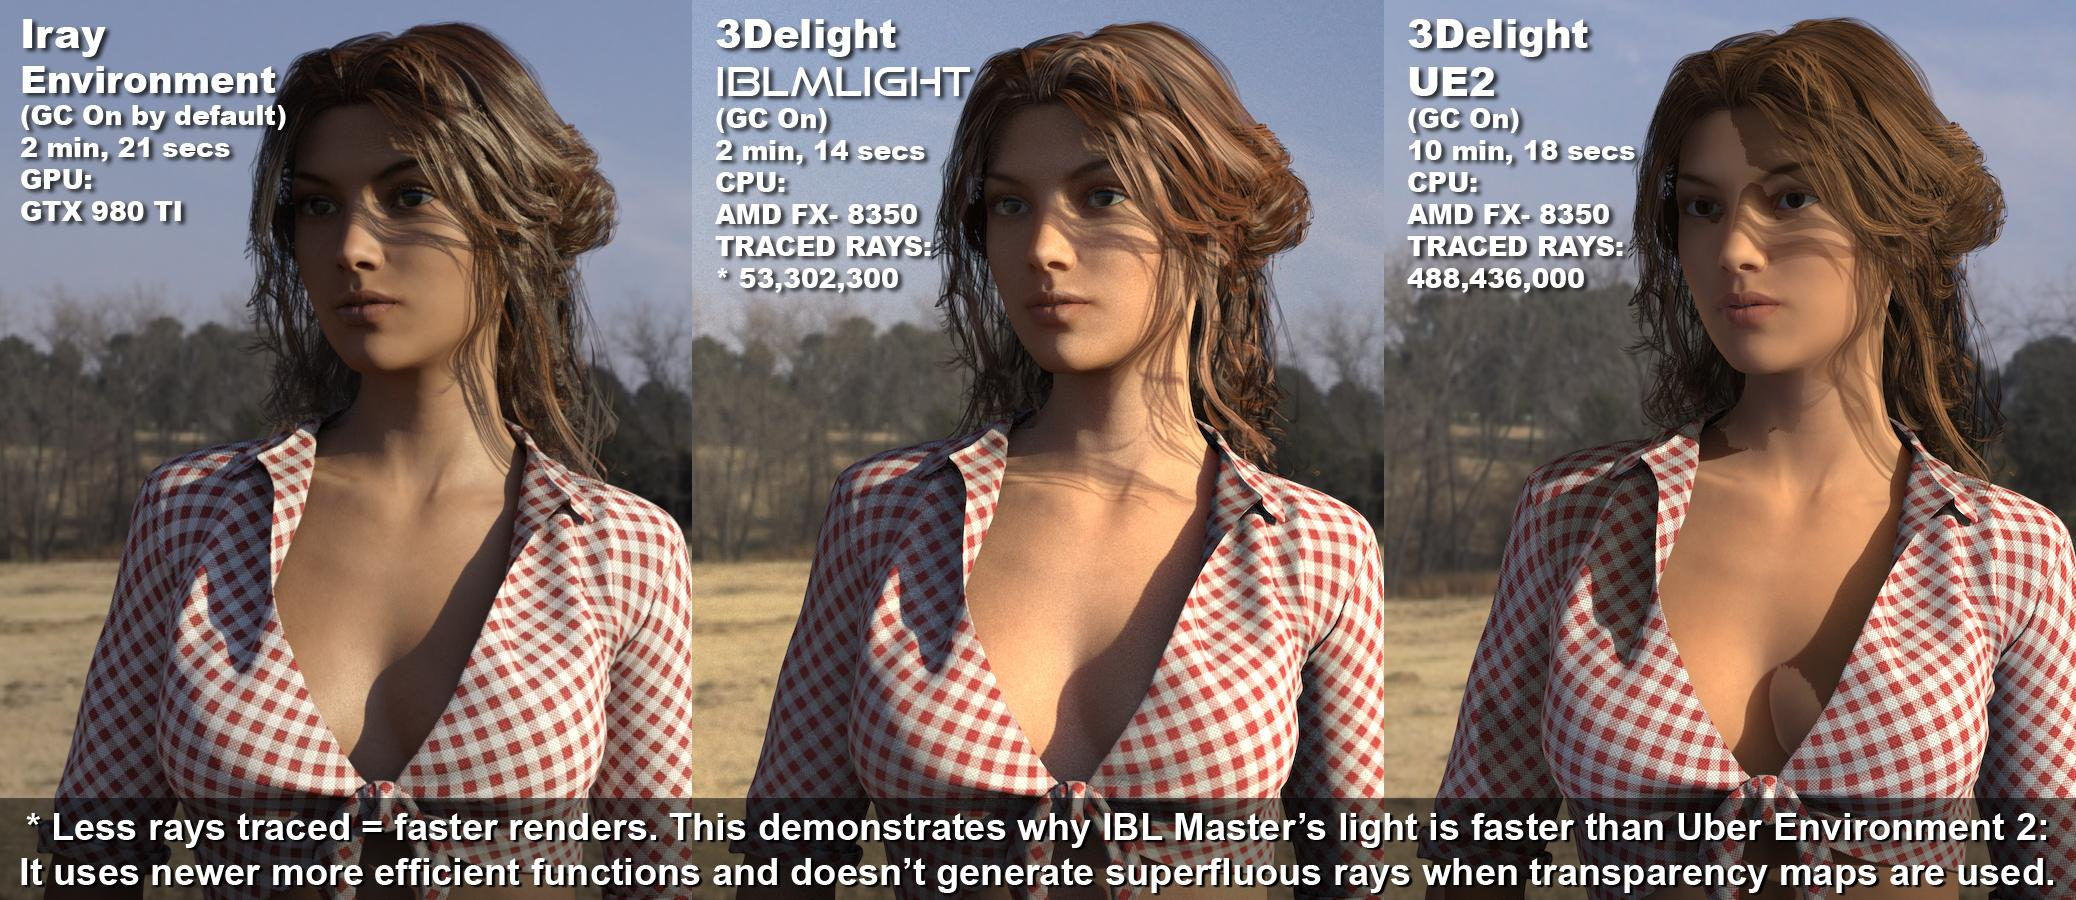 IBL Master: Iray vs IBLM Light vs Uber Environment 2, shows ray counts